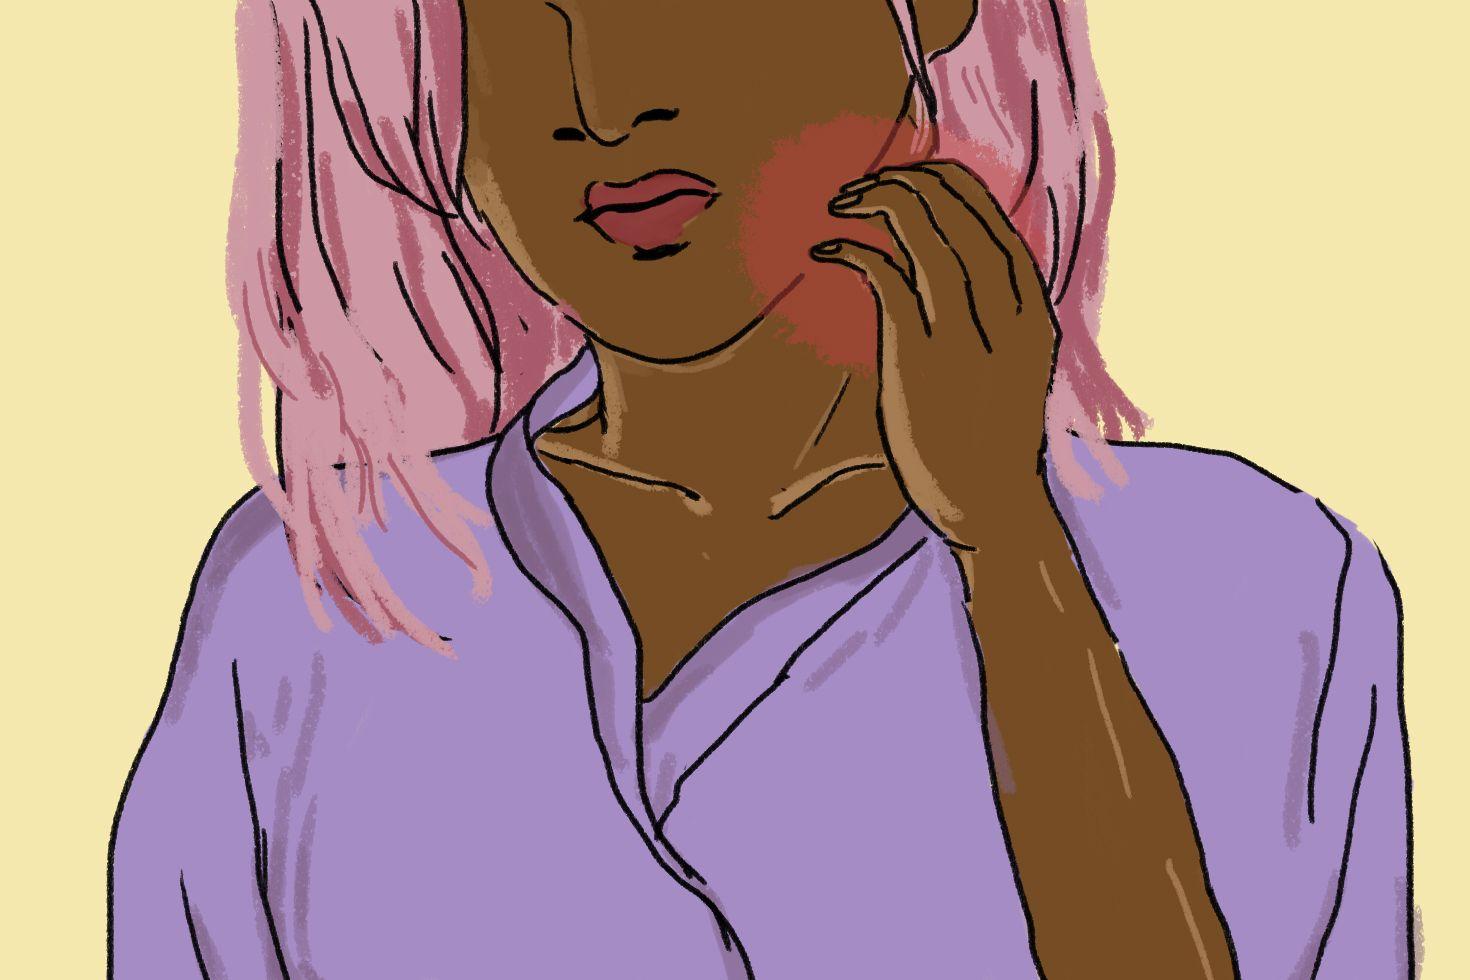 Woman Scratching Neck - Eczema Illustration